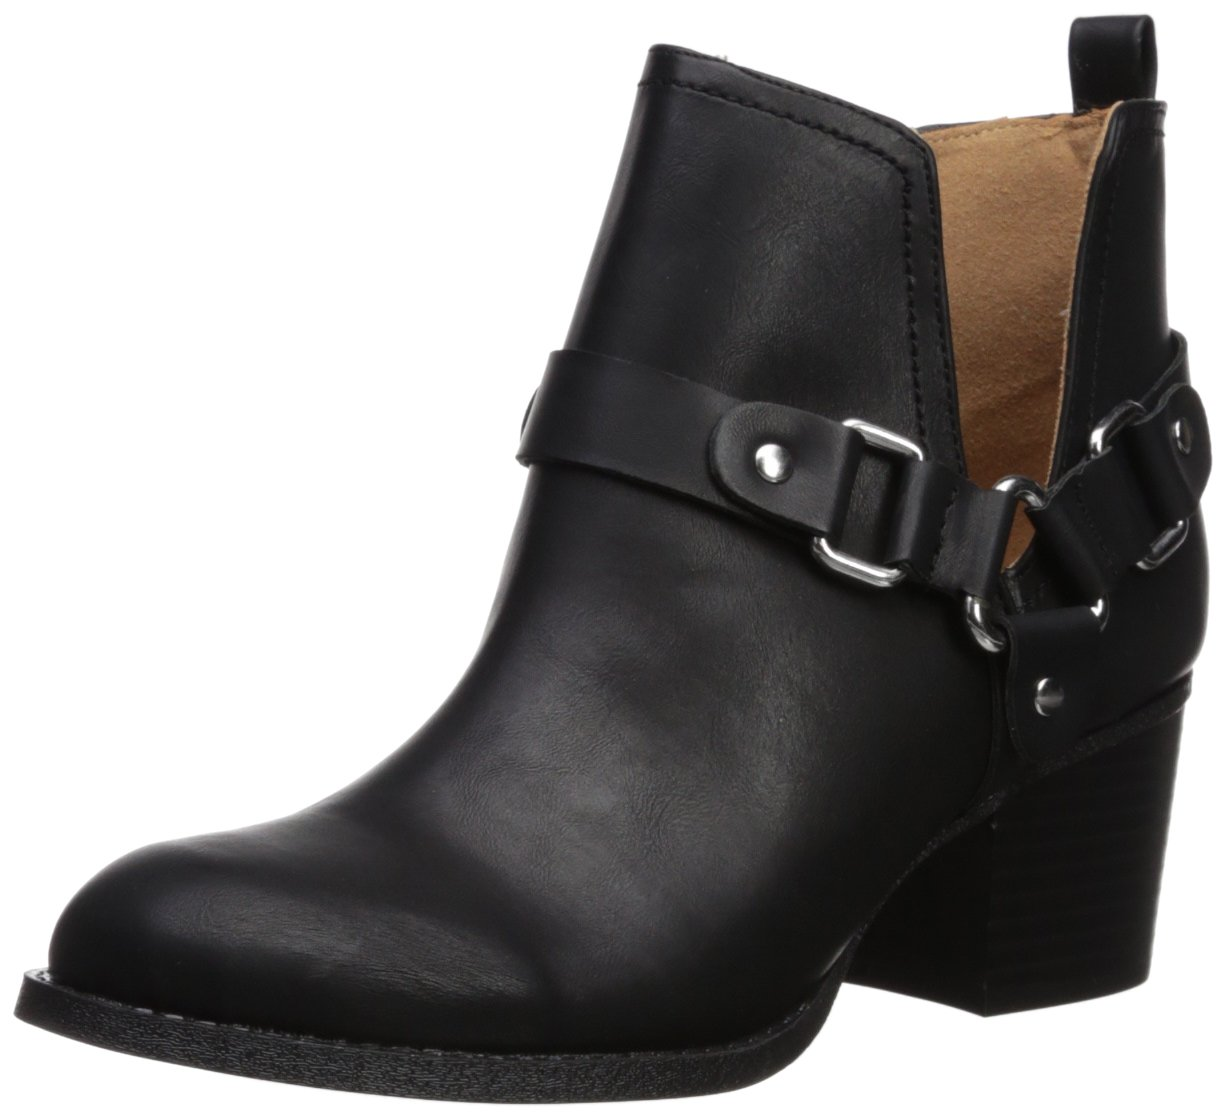 Madden Girl Women's Finian Ankle Boot B074Z2C3BP 9 B(M) US|Black Paris